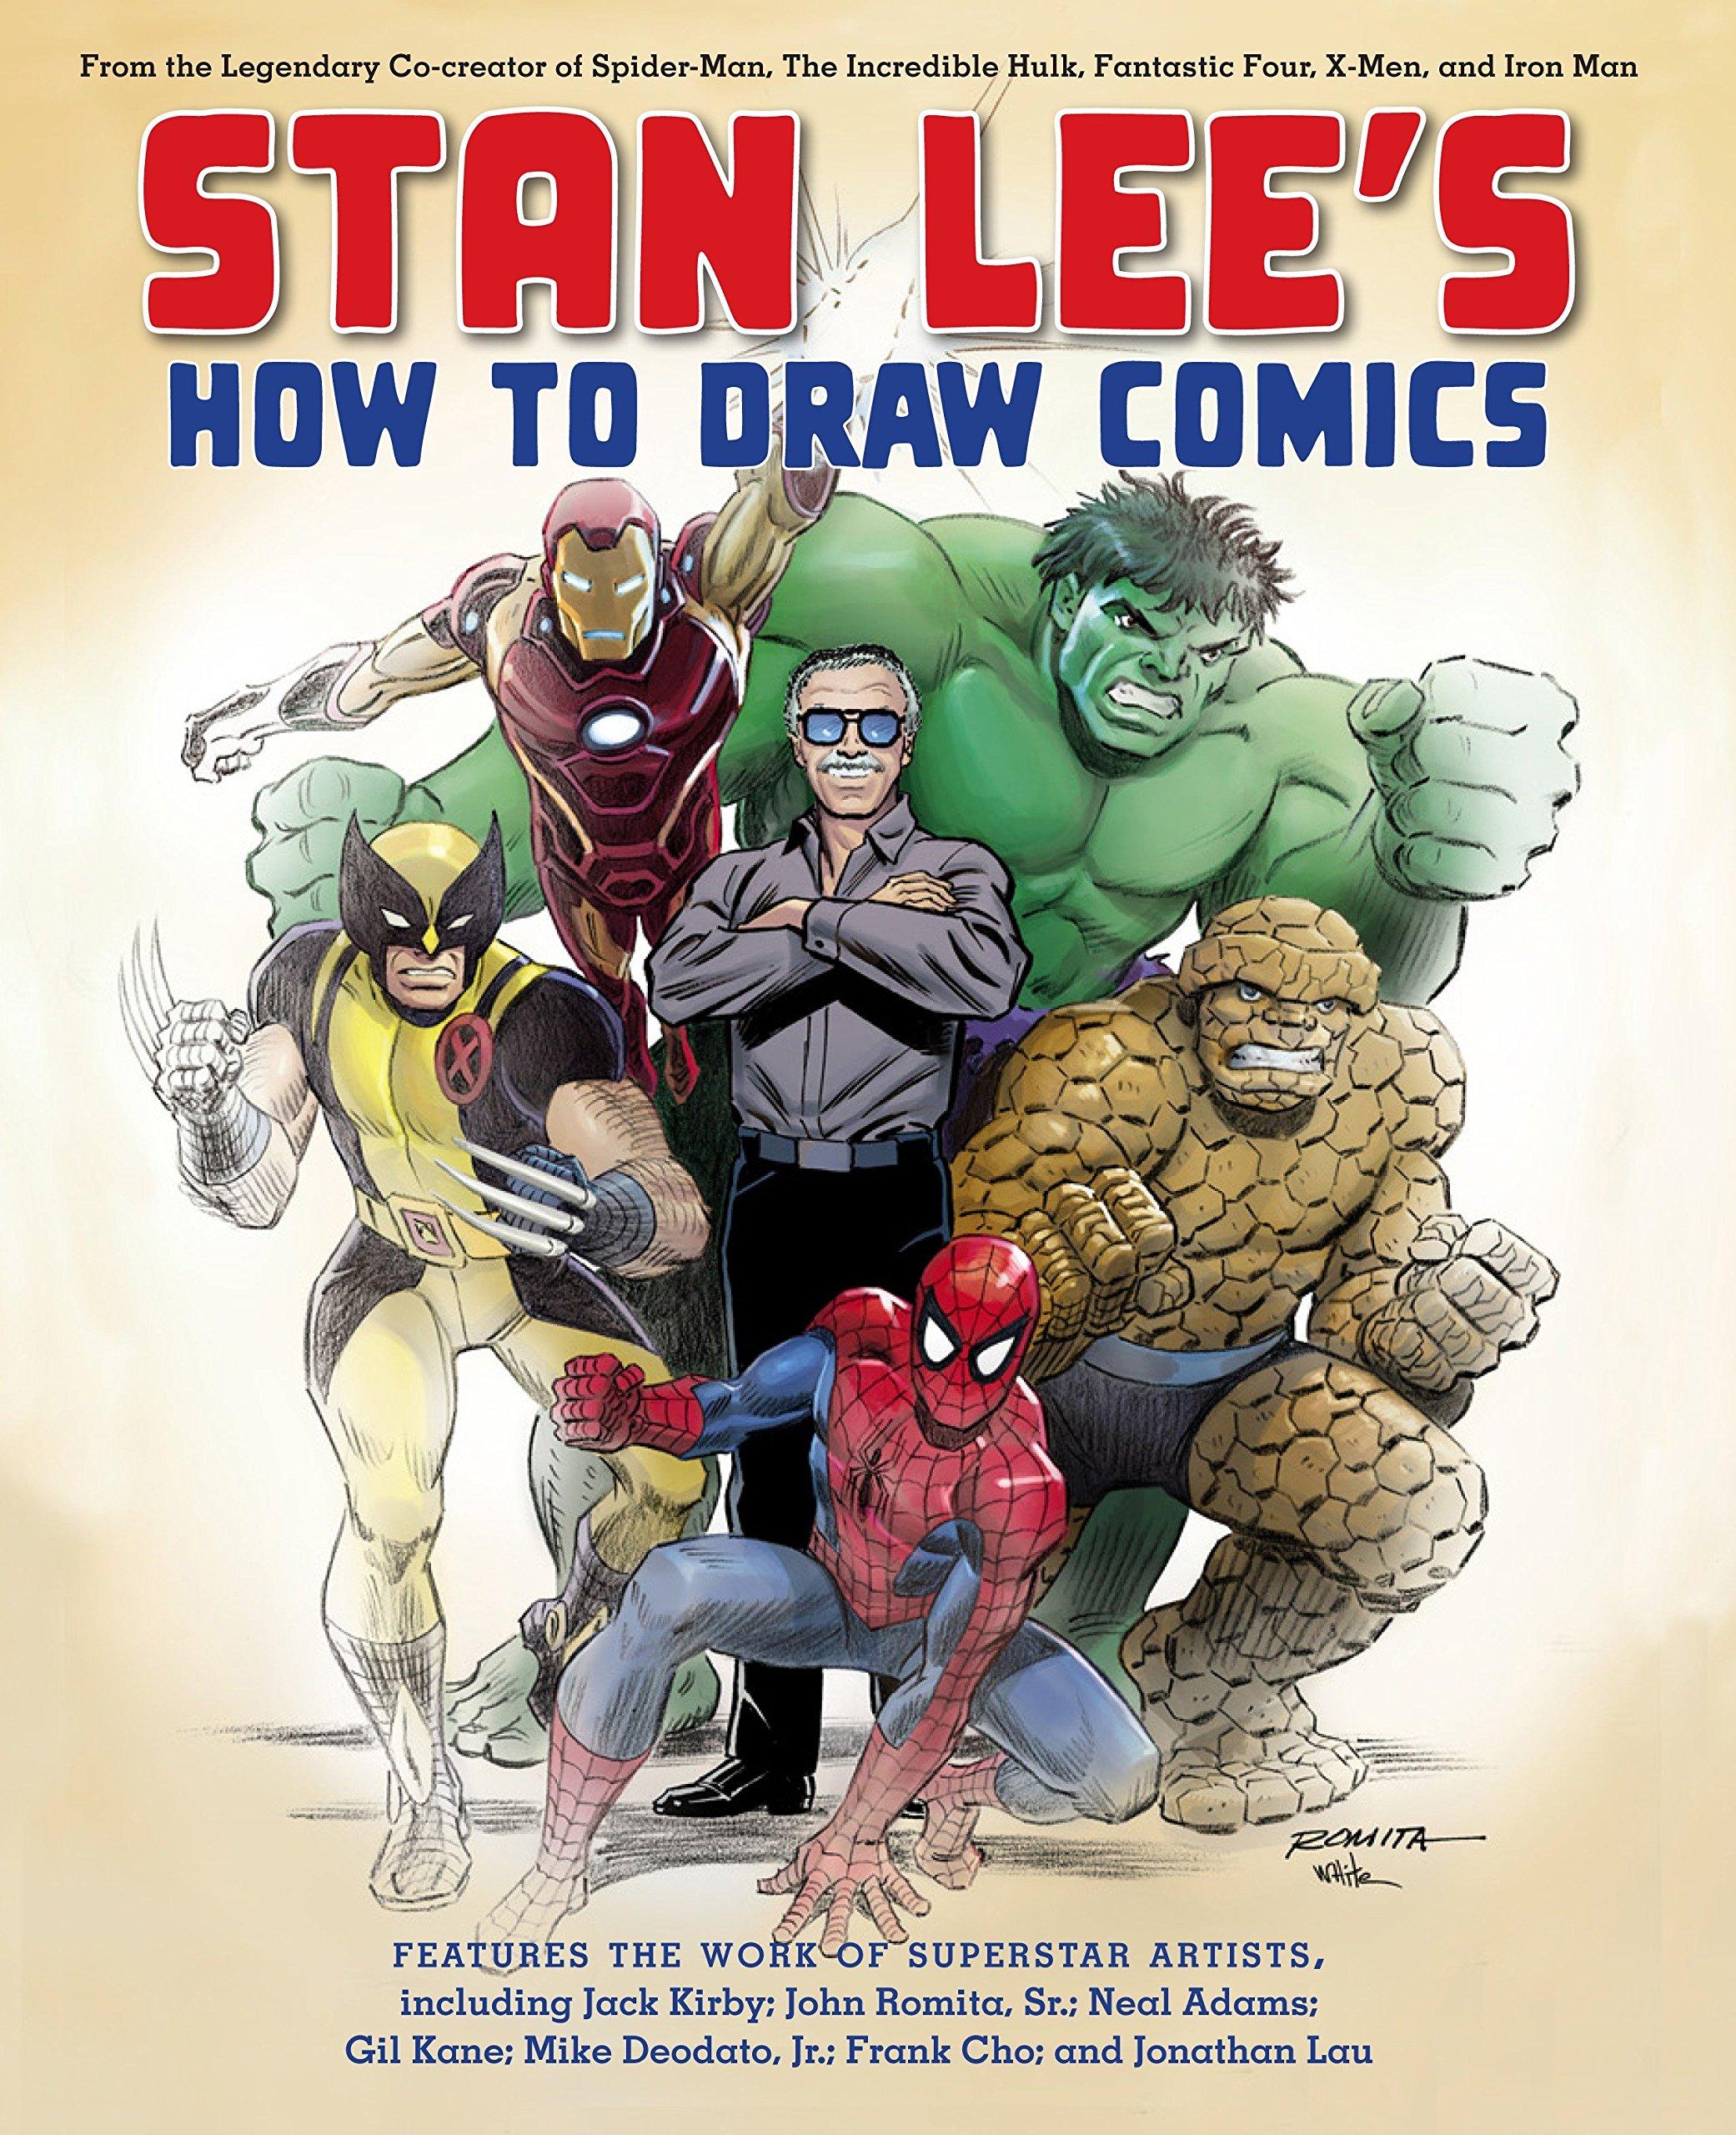 Stan Lee S How To Draw Comics From The Legendary Creator Of Spider Man The Incredible Hulk Fantastic Four X Men And Iron Man Amazon Ca Lee Stan Kirby Jack Romita Sr John Adams Neal Kane